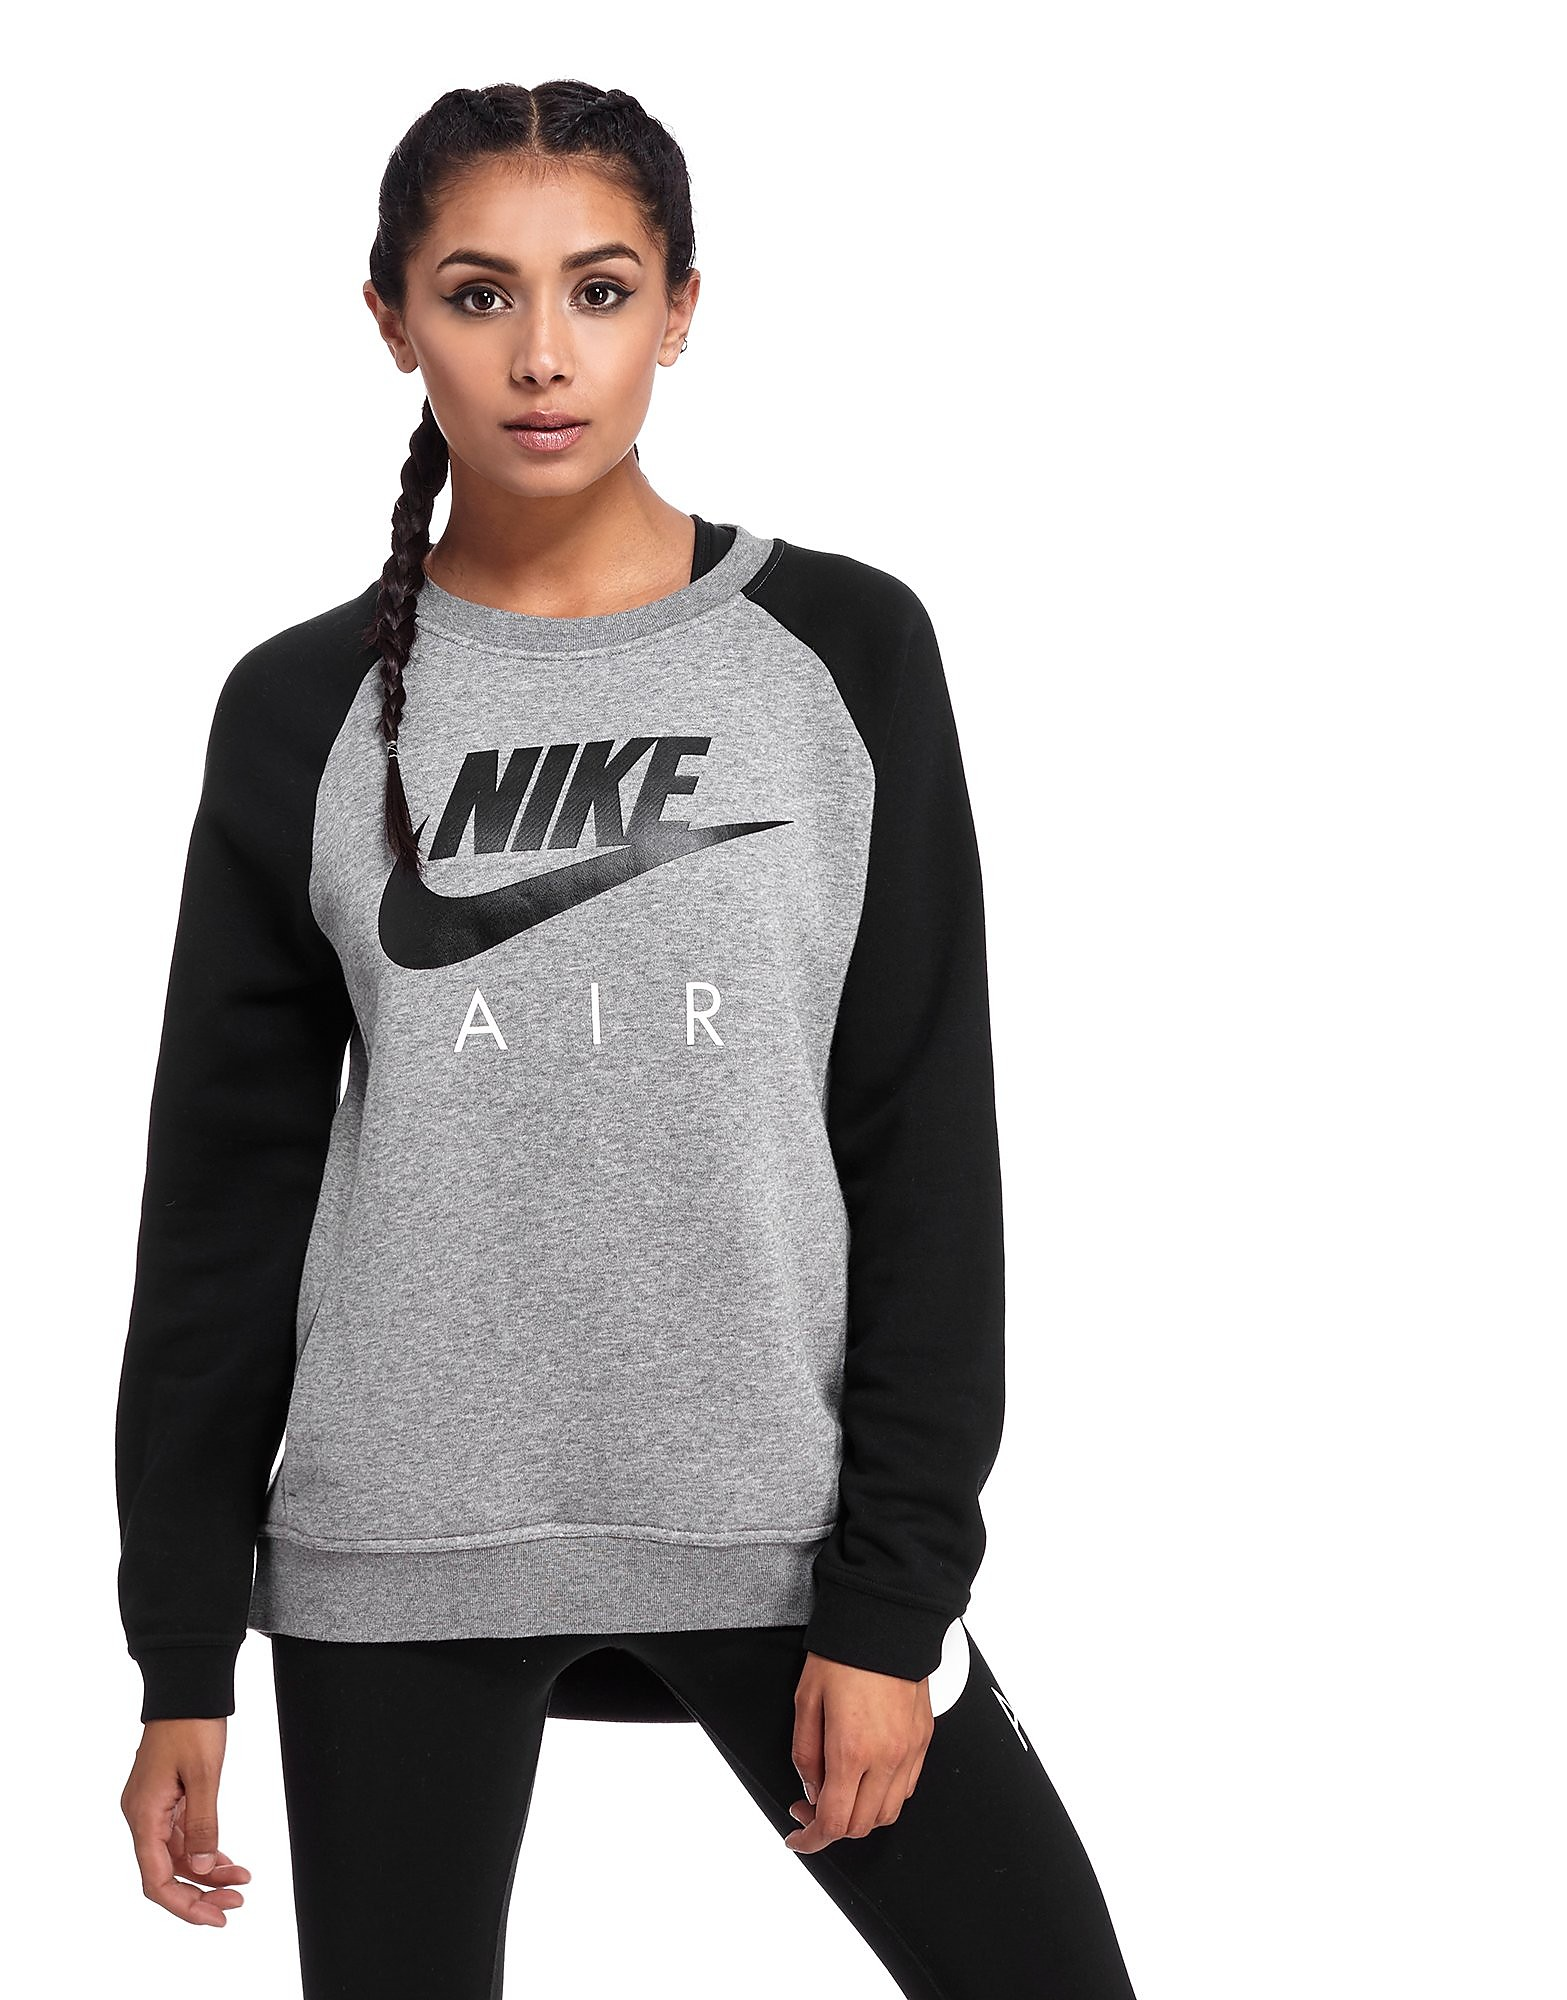 Nike Air Crew Sweatshirt - Dark Grey Black - Womens - Sports King Store d06dd9c10c